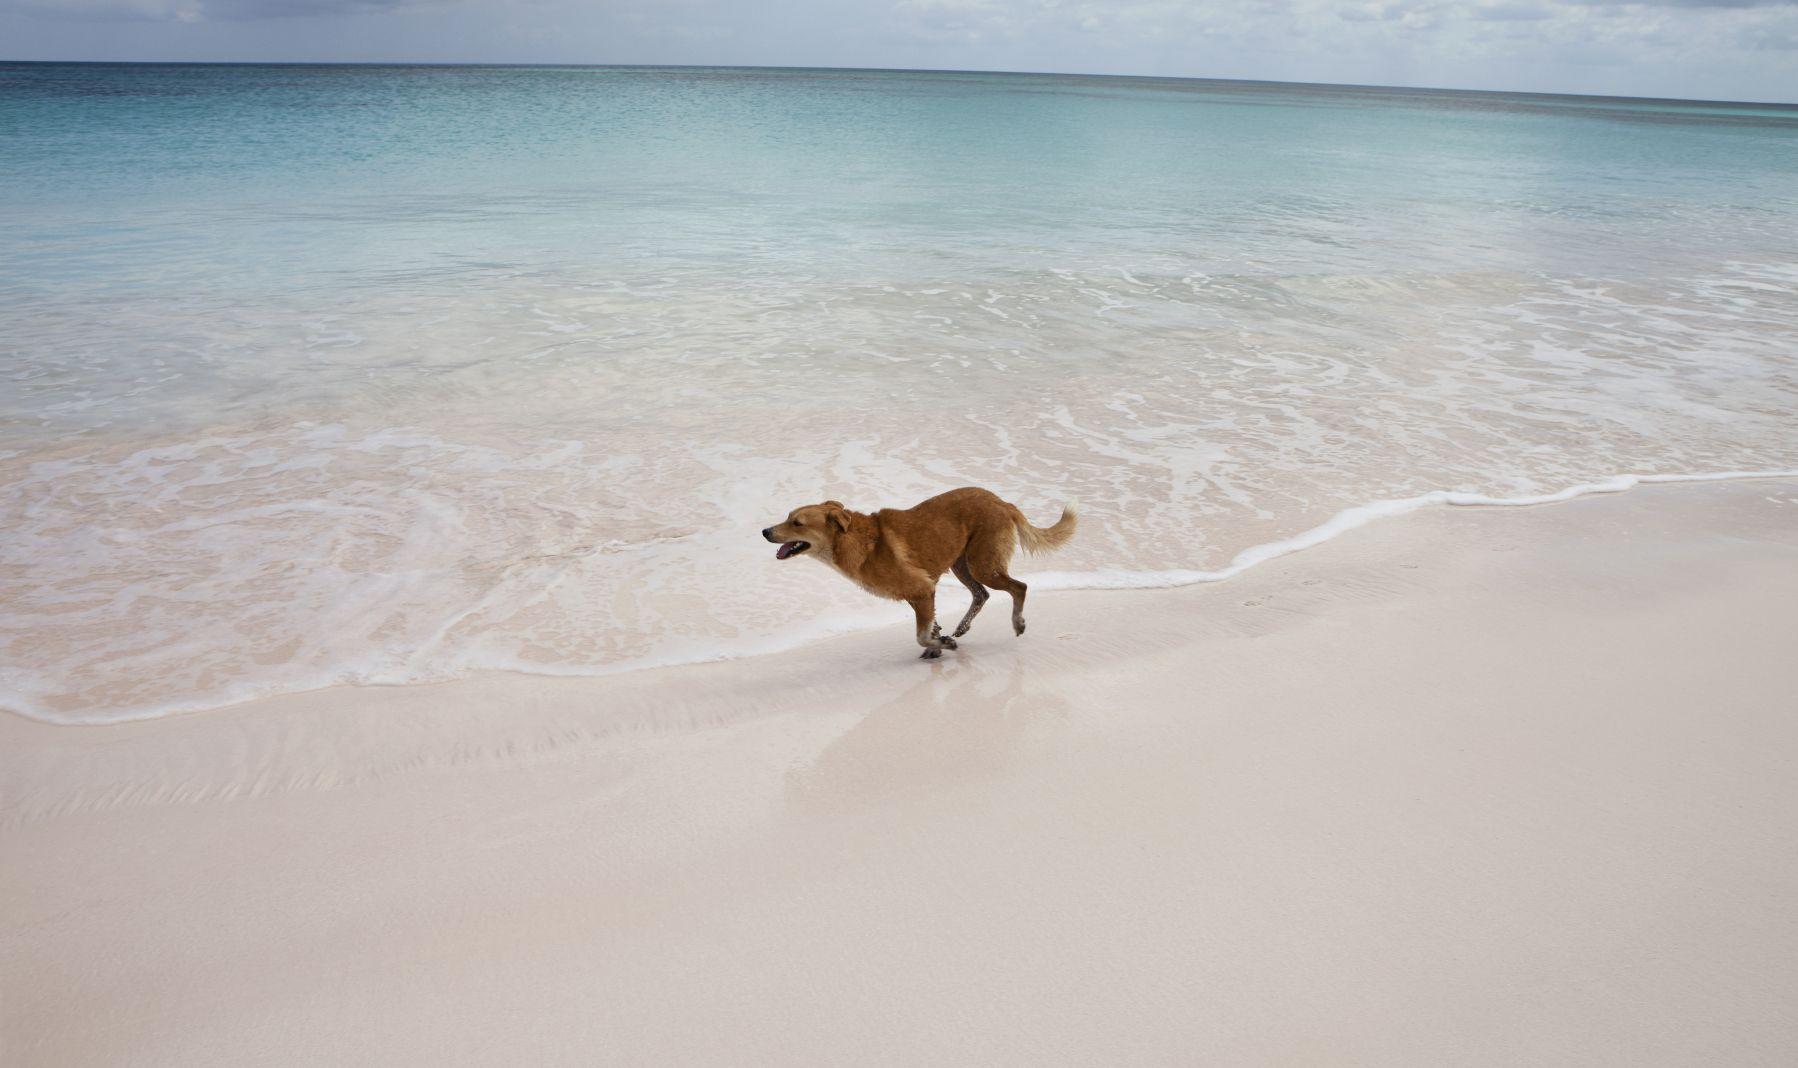 Pet Friendly Hotels in Florida - Naples Bay Resort | Florida